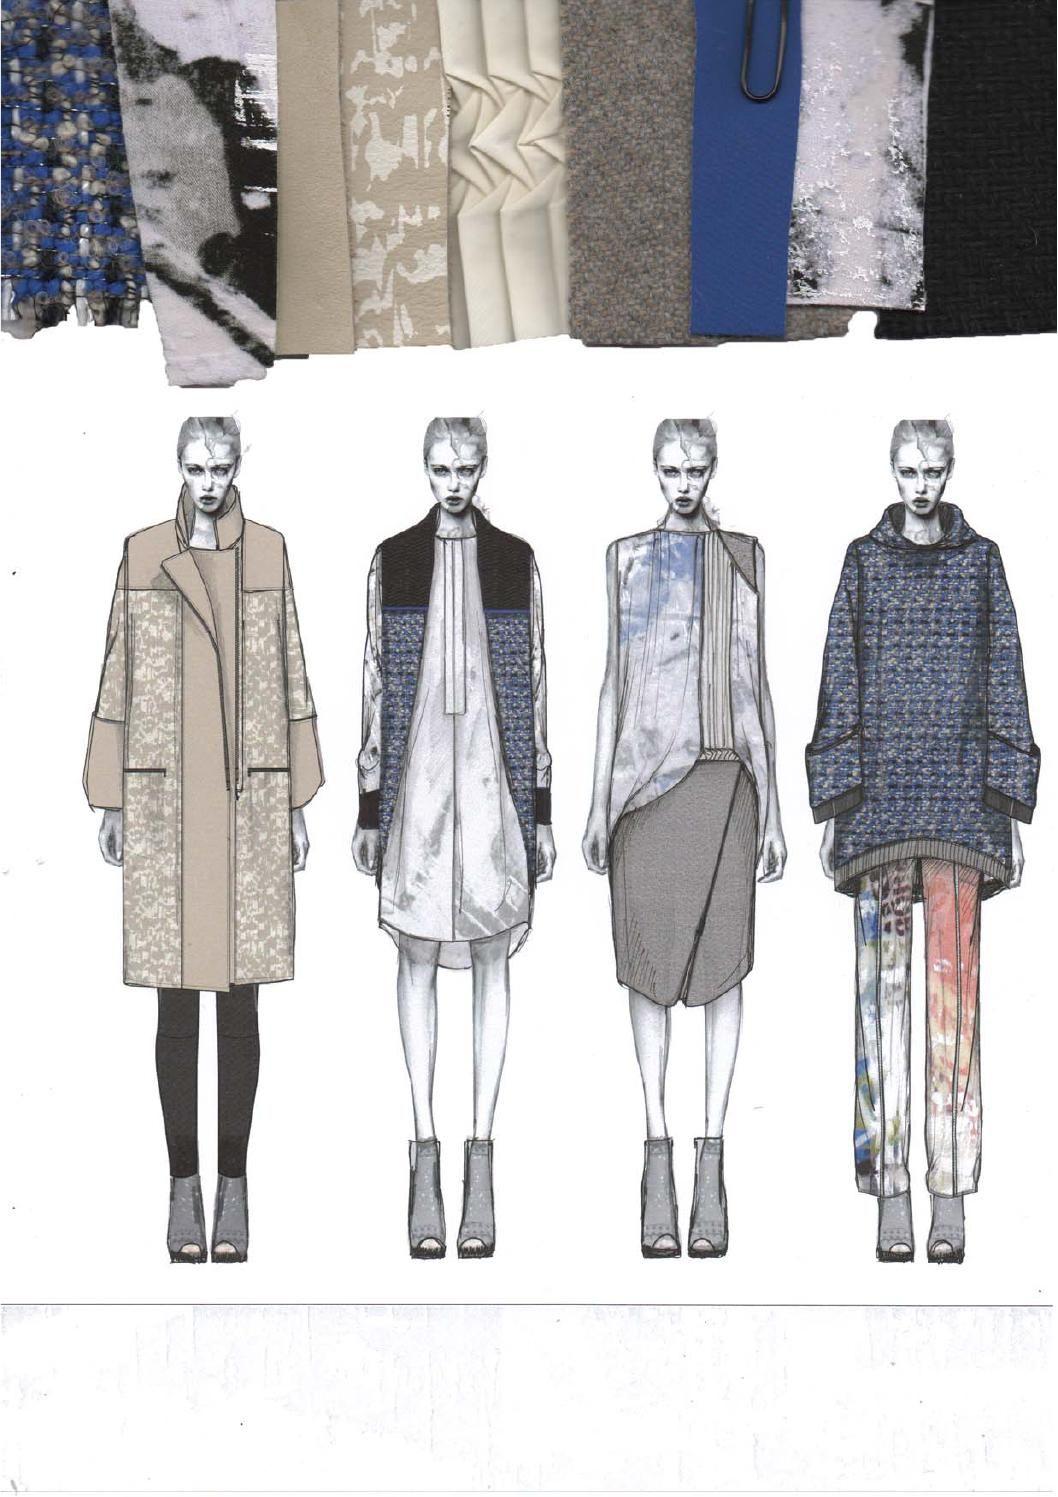 Westminster amy dee | Work portfolio | Fashion portfolio ...